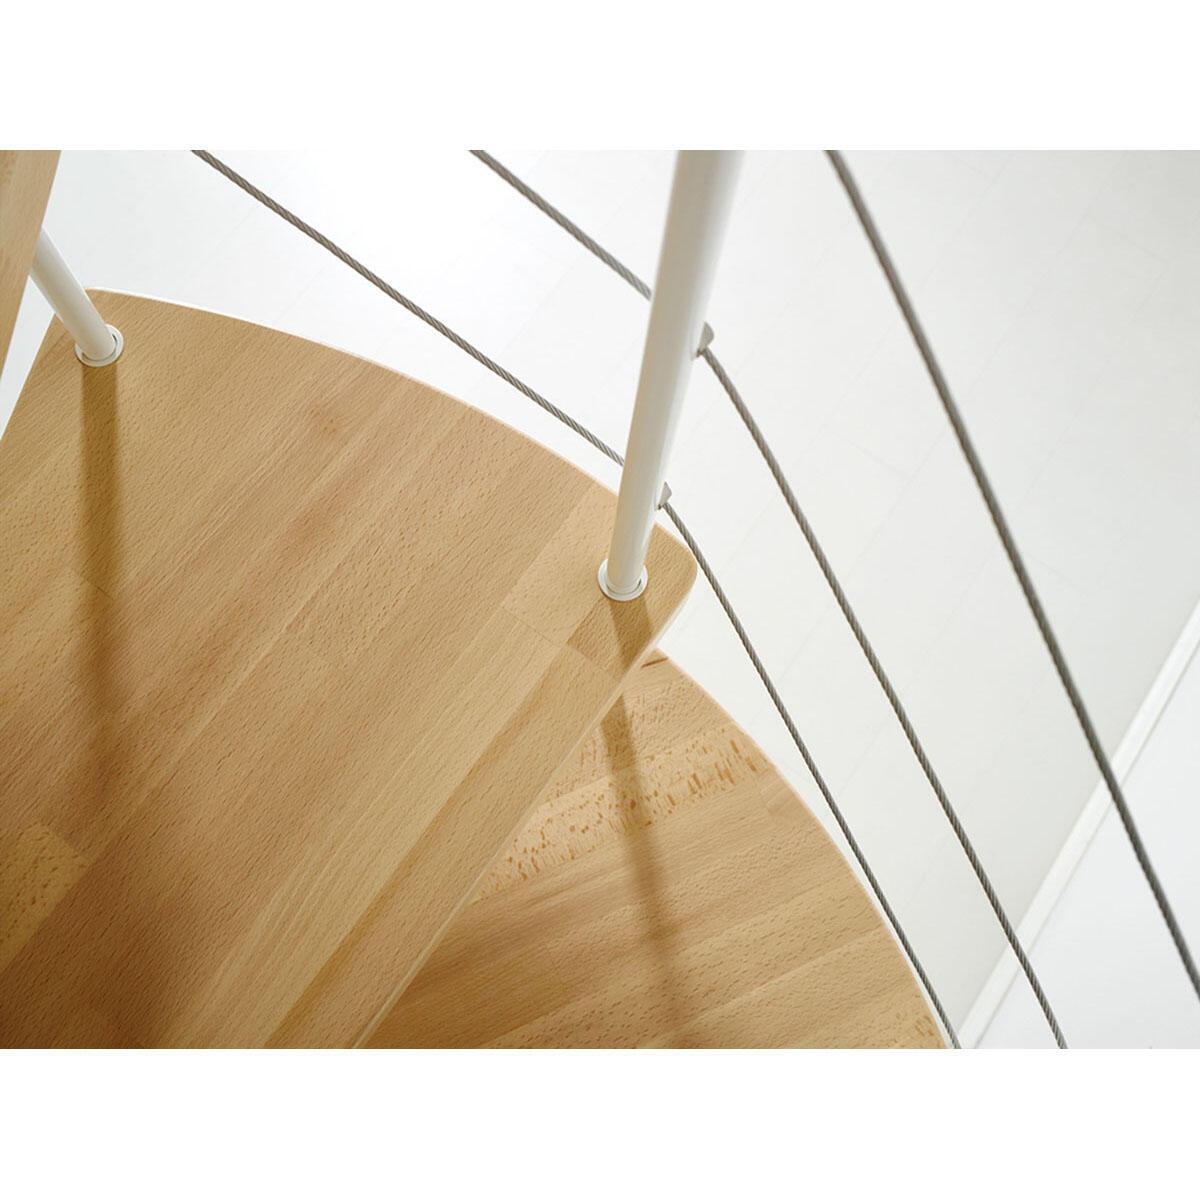 Scala a chiocciola tonda Symphonie FONTANOT L 120 cm, gradino noce, struttura bianco - 3